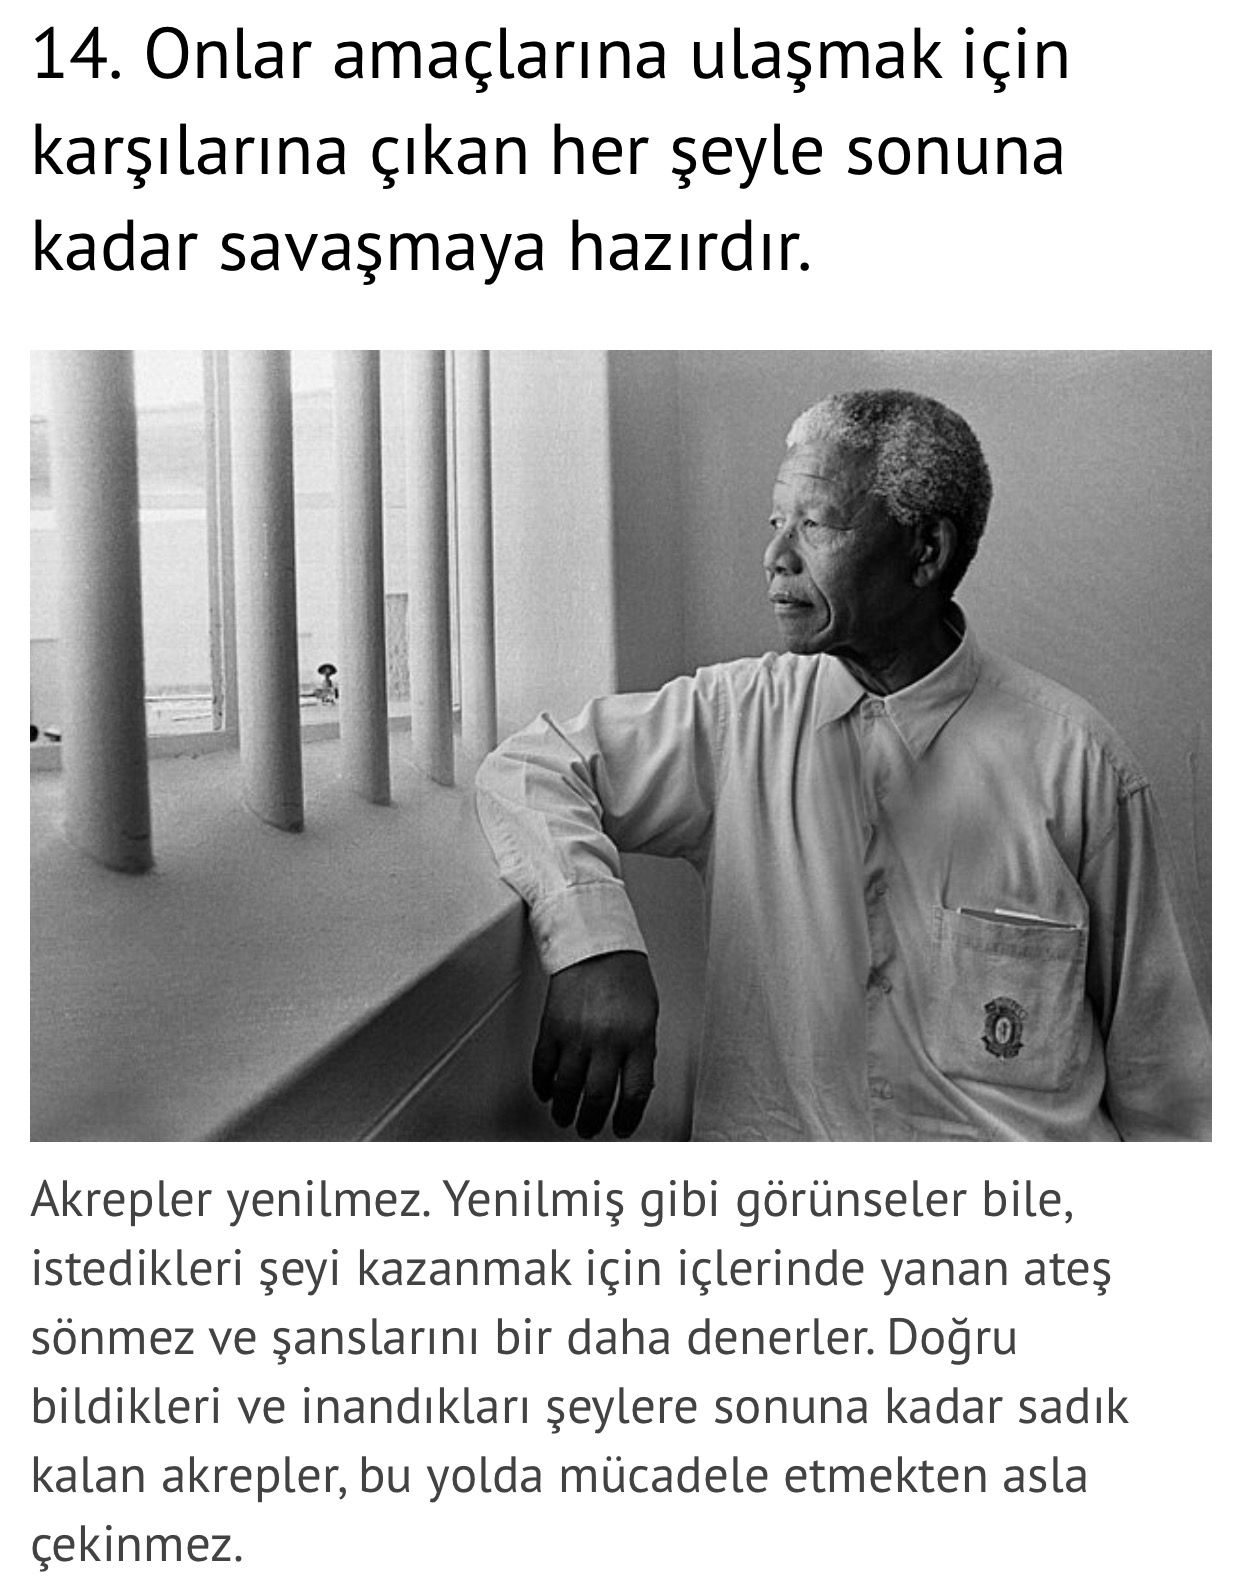 Mandela Quotes About Love Pinbiran Akacan On Scorpio  Pinterest  Scorpio